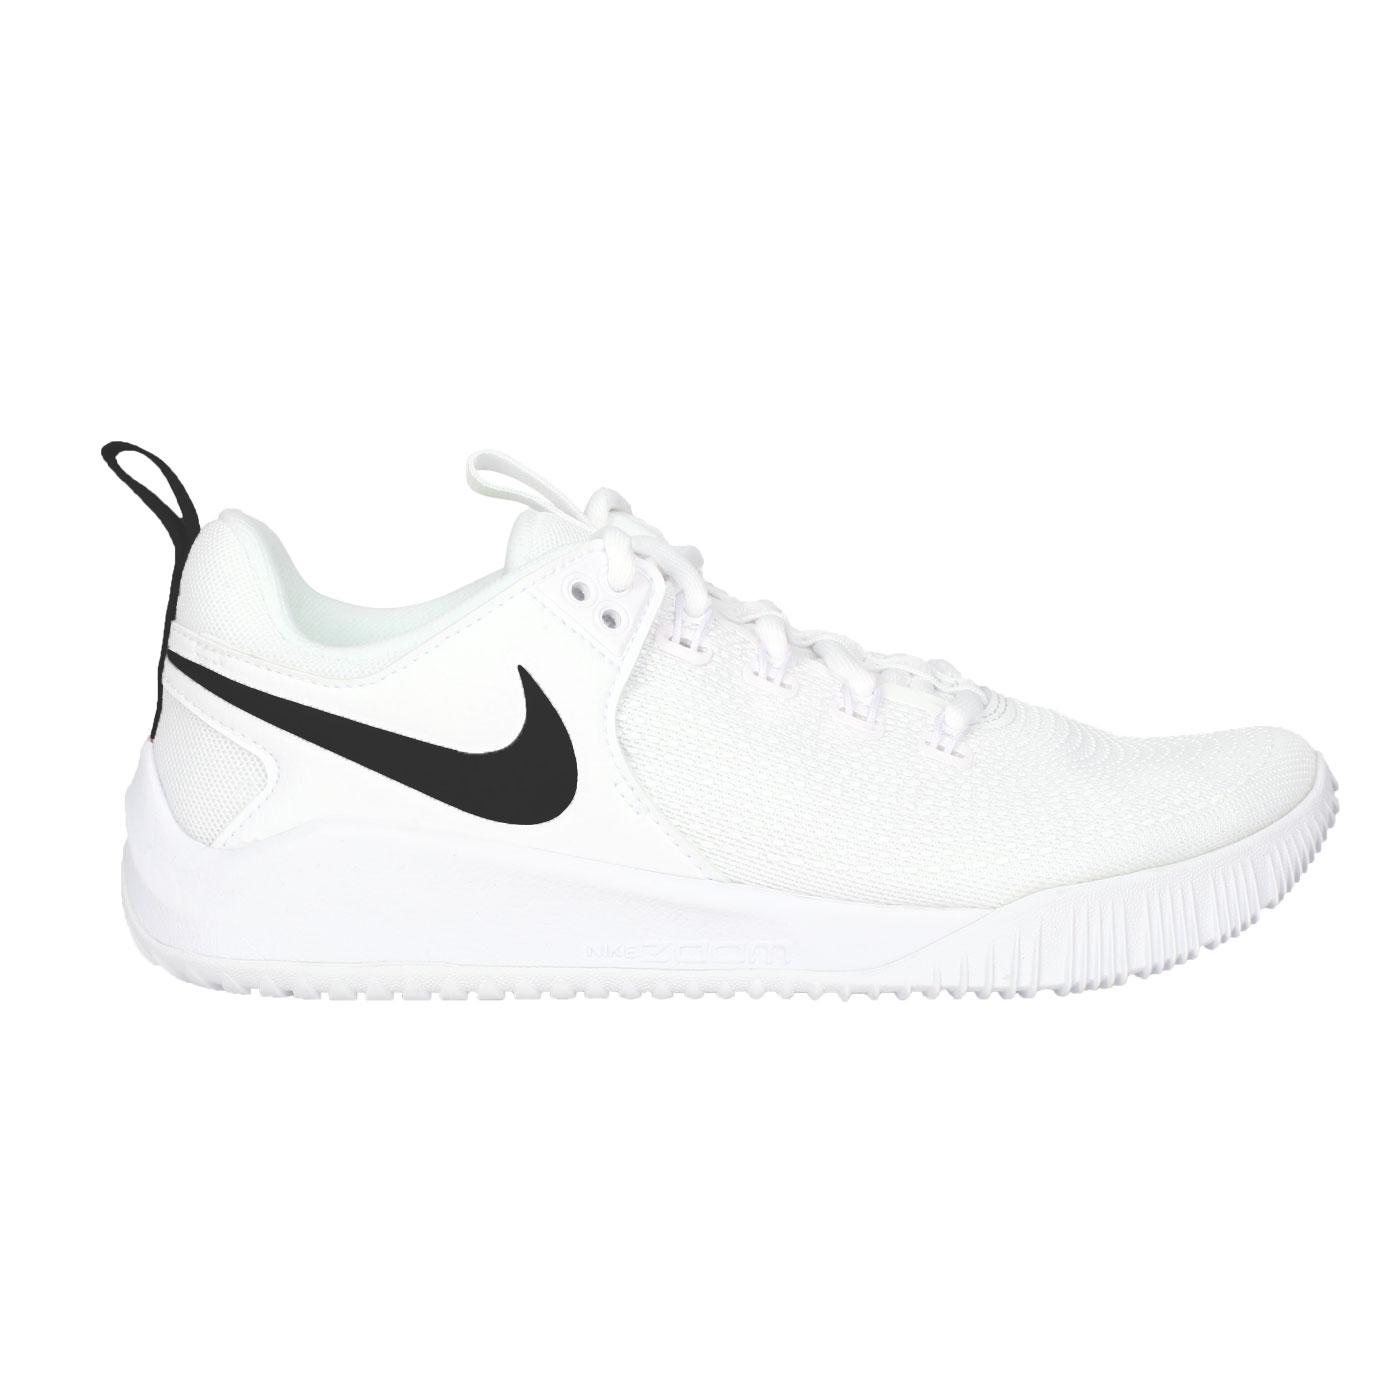 NIKE 排球鞋  @WMNS ZOOM HYPERACE 2@AA0286100 - 白黑